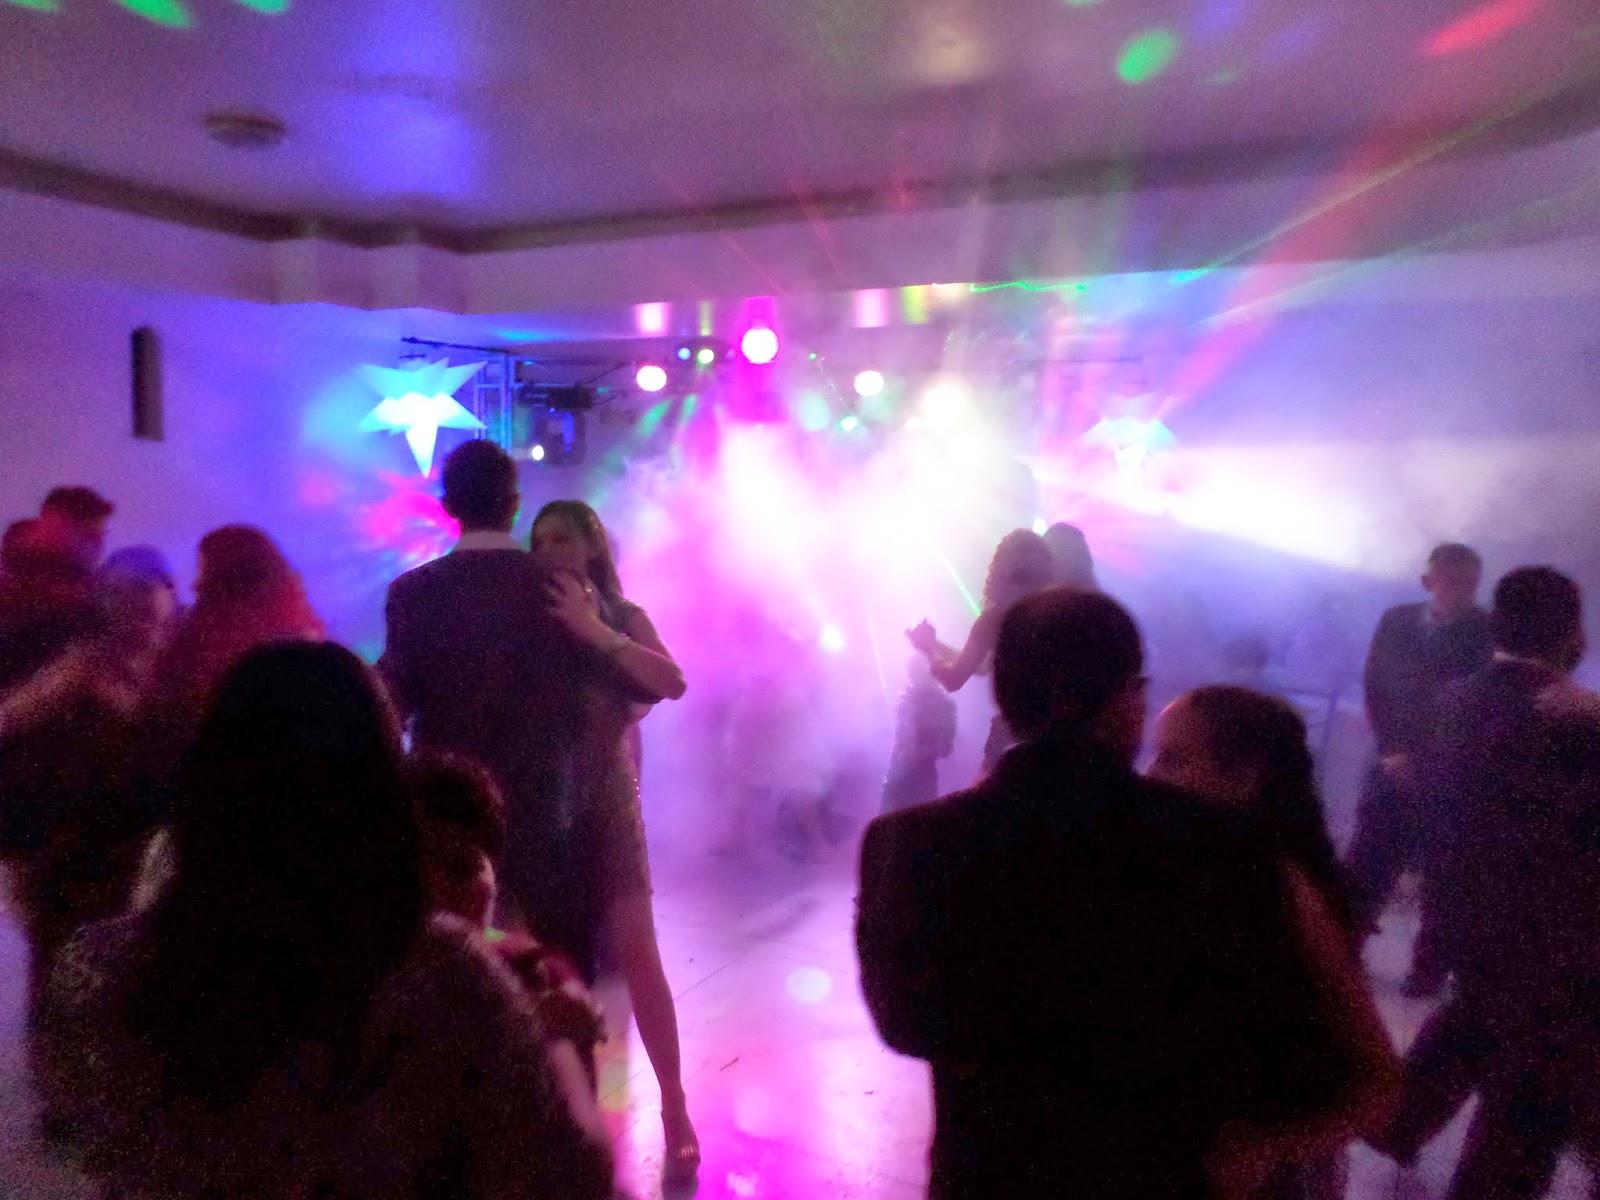 DJ para festas 47-30264086, DJ EM JOINVILLE, DJ PARA FESTAS, DJ PARA EVENTOS,, DJ PARA CASAMENTO, DJ PARA FORMATURA, EVENTOS JOINVILLE, STAR FOTOS